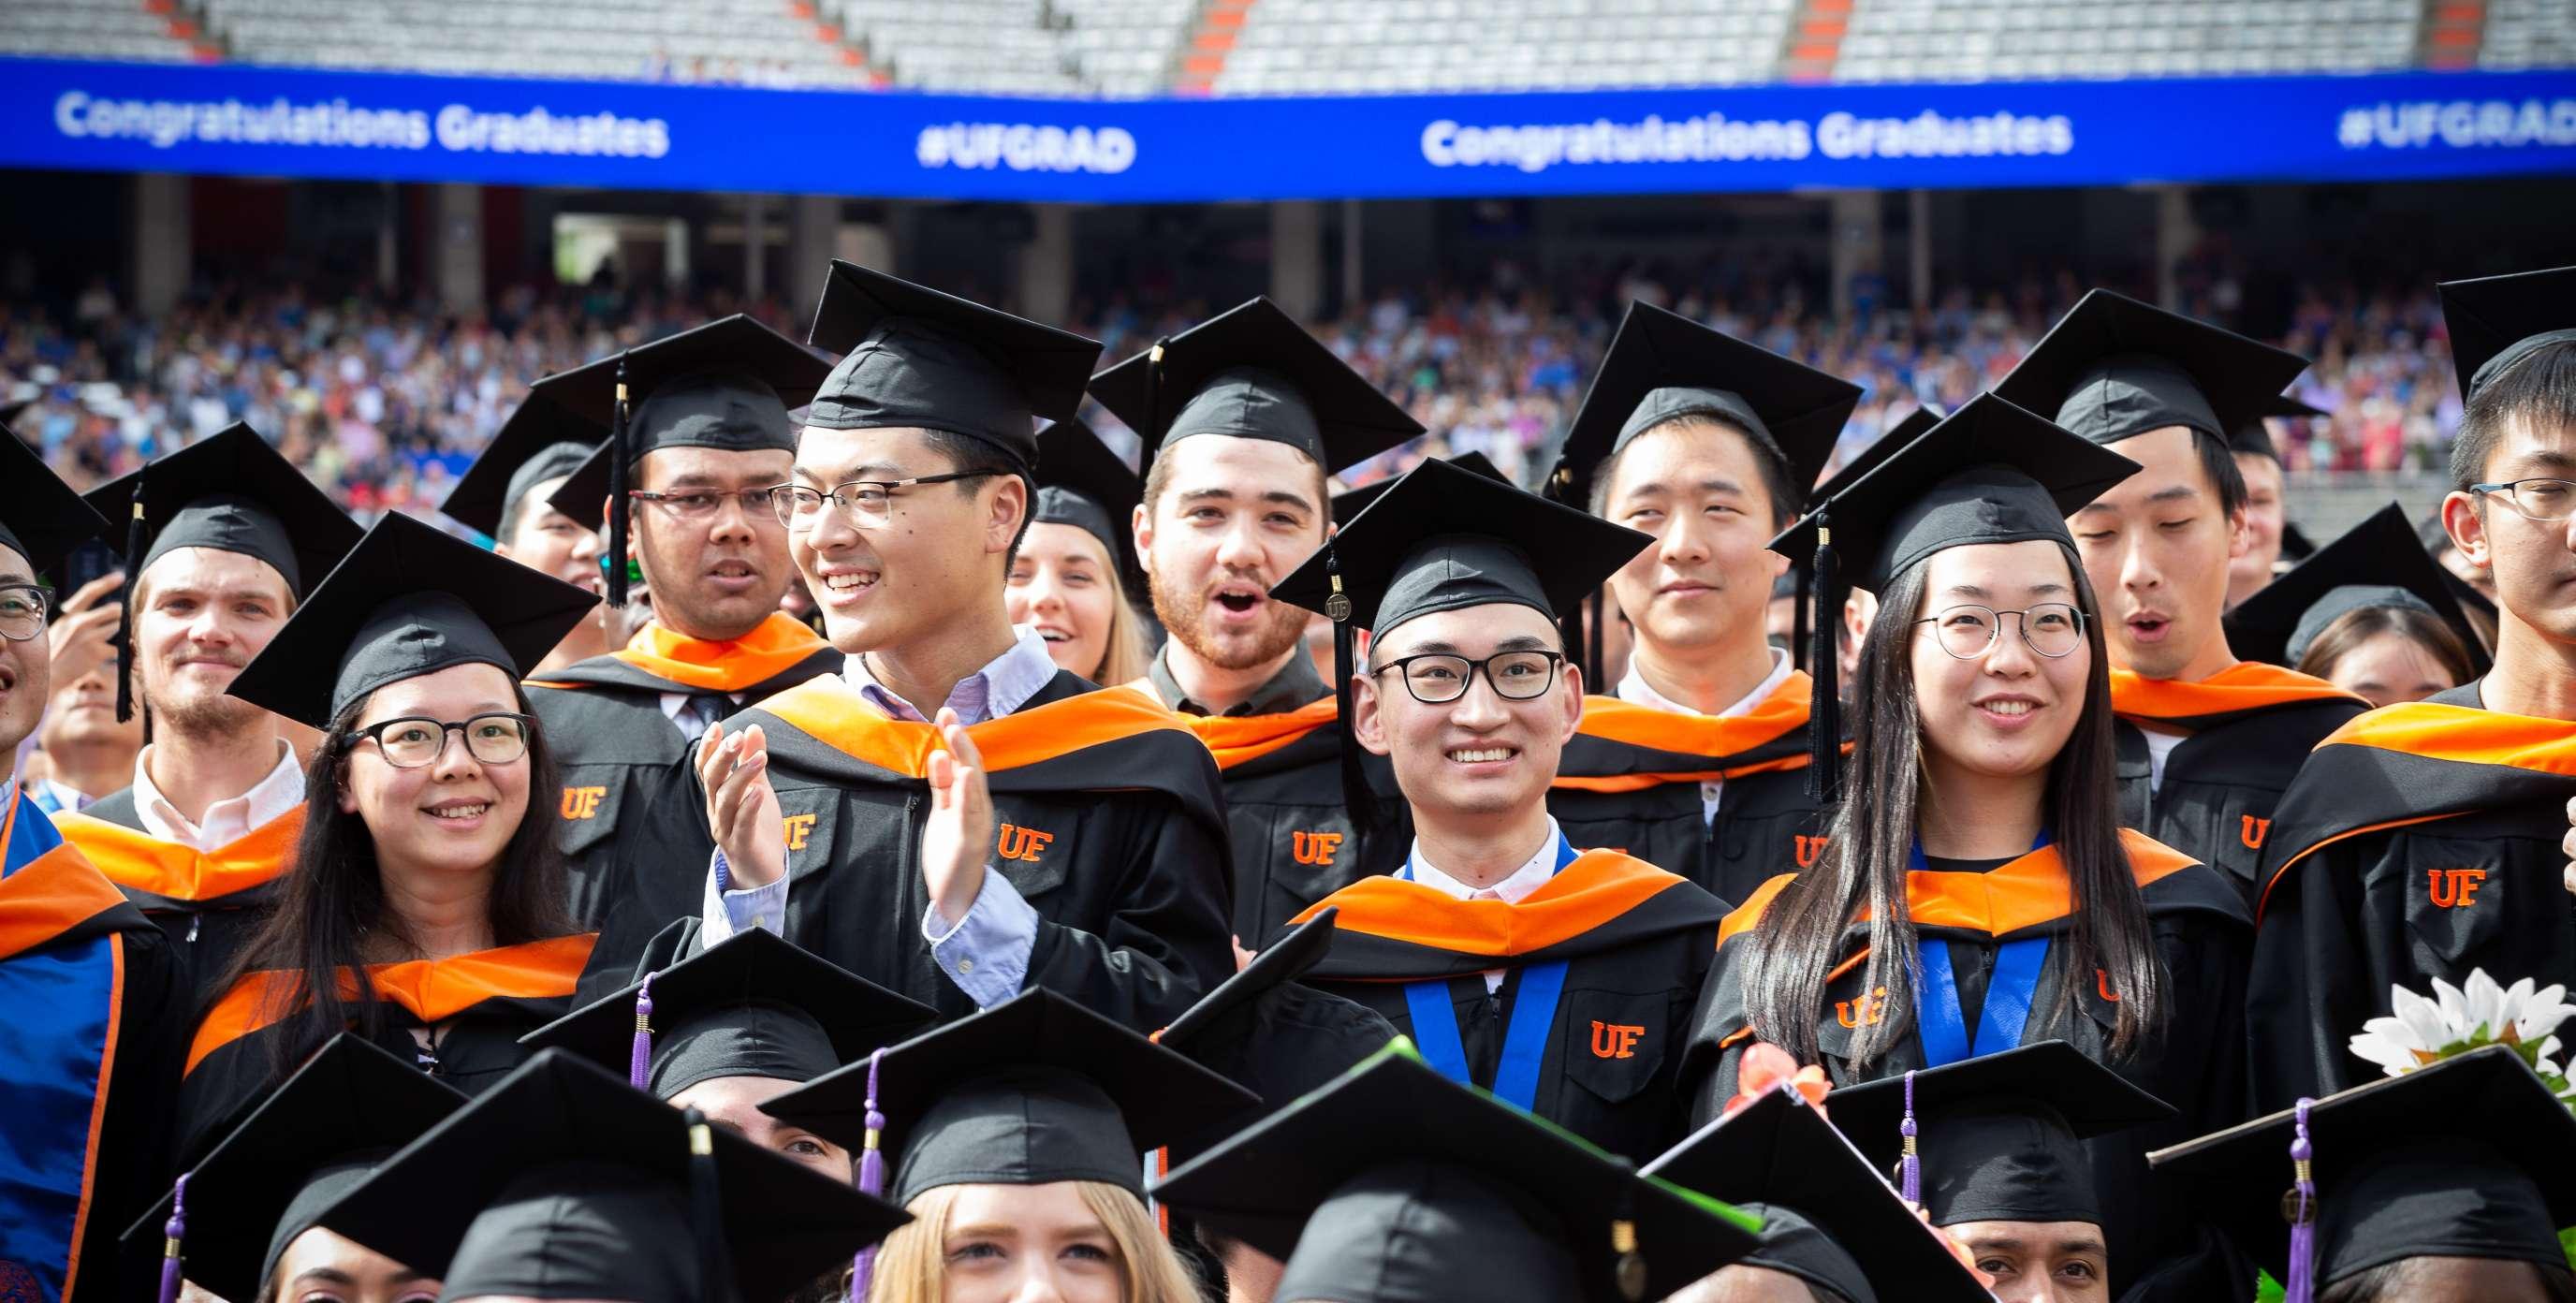 UF Students graduate at Ben Hill Griffen Stadium